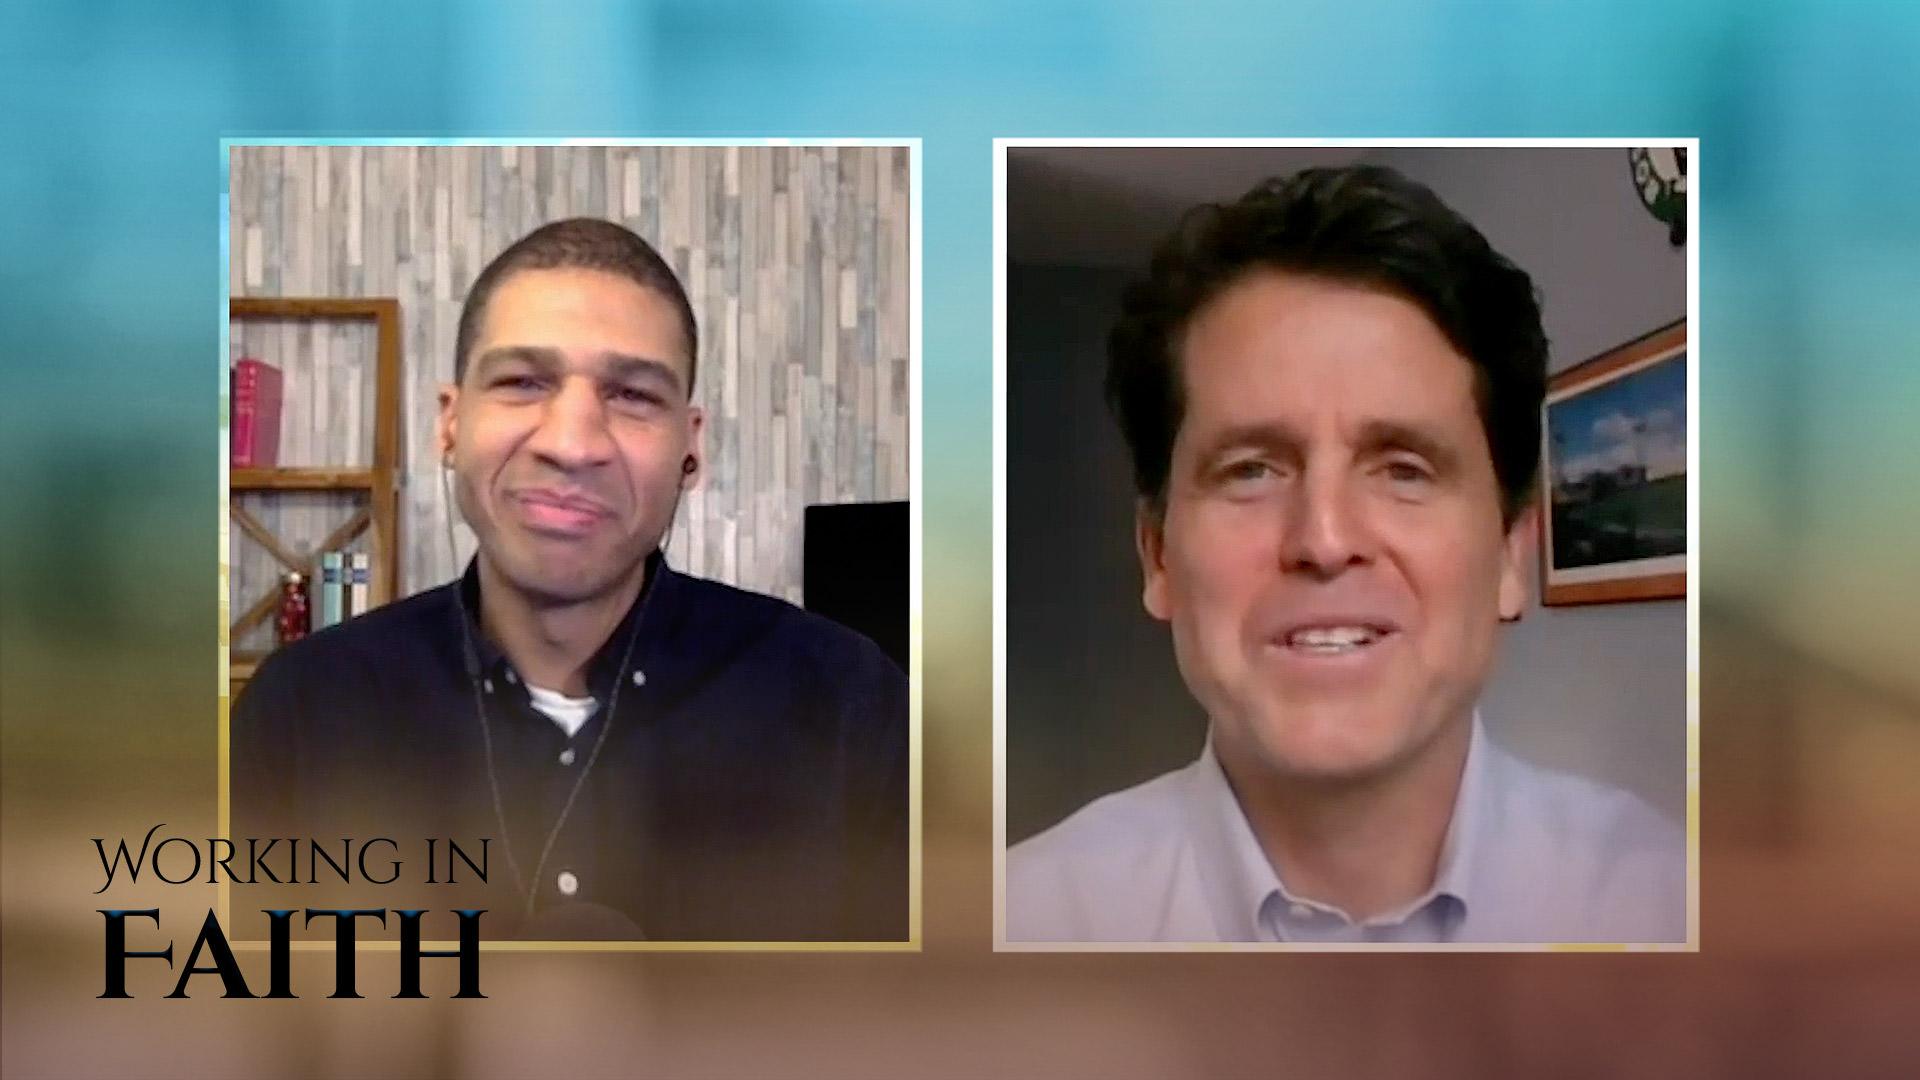 Mark Shriver | Working in Faith: Behind the Lens